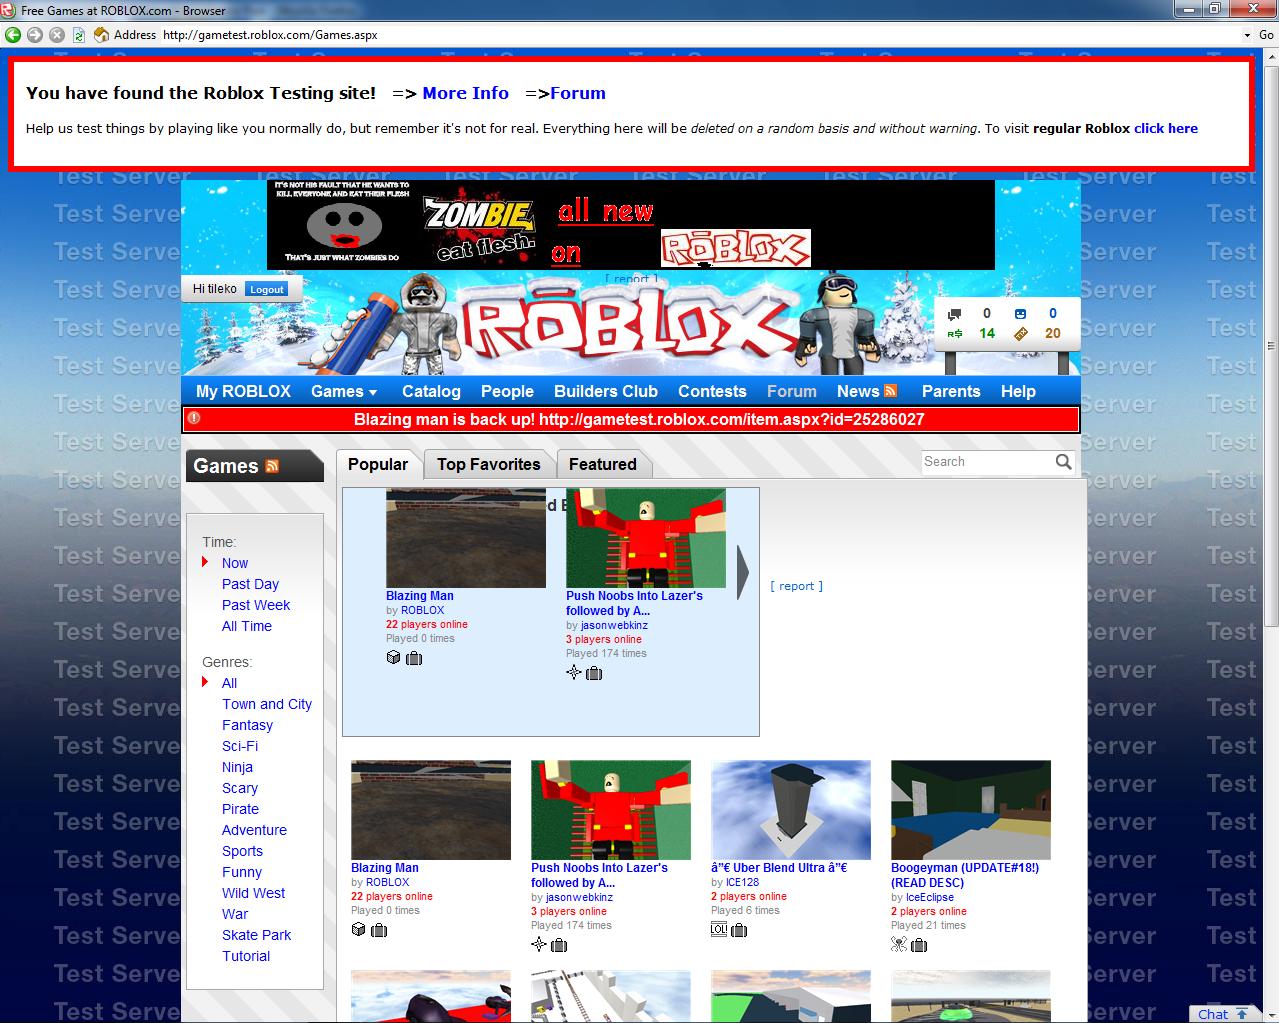 roblox test site